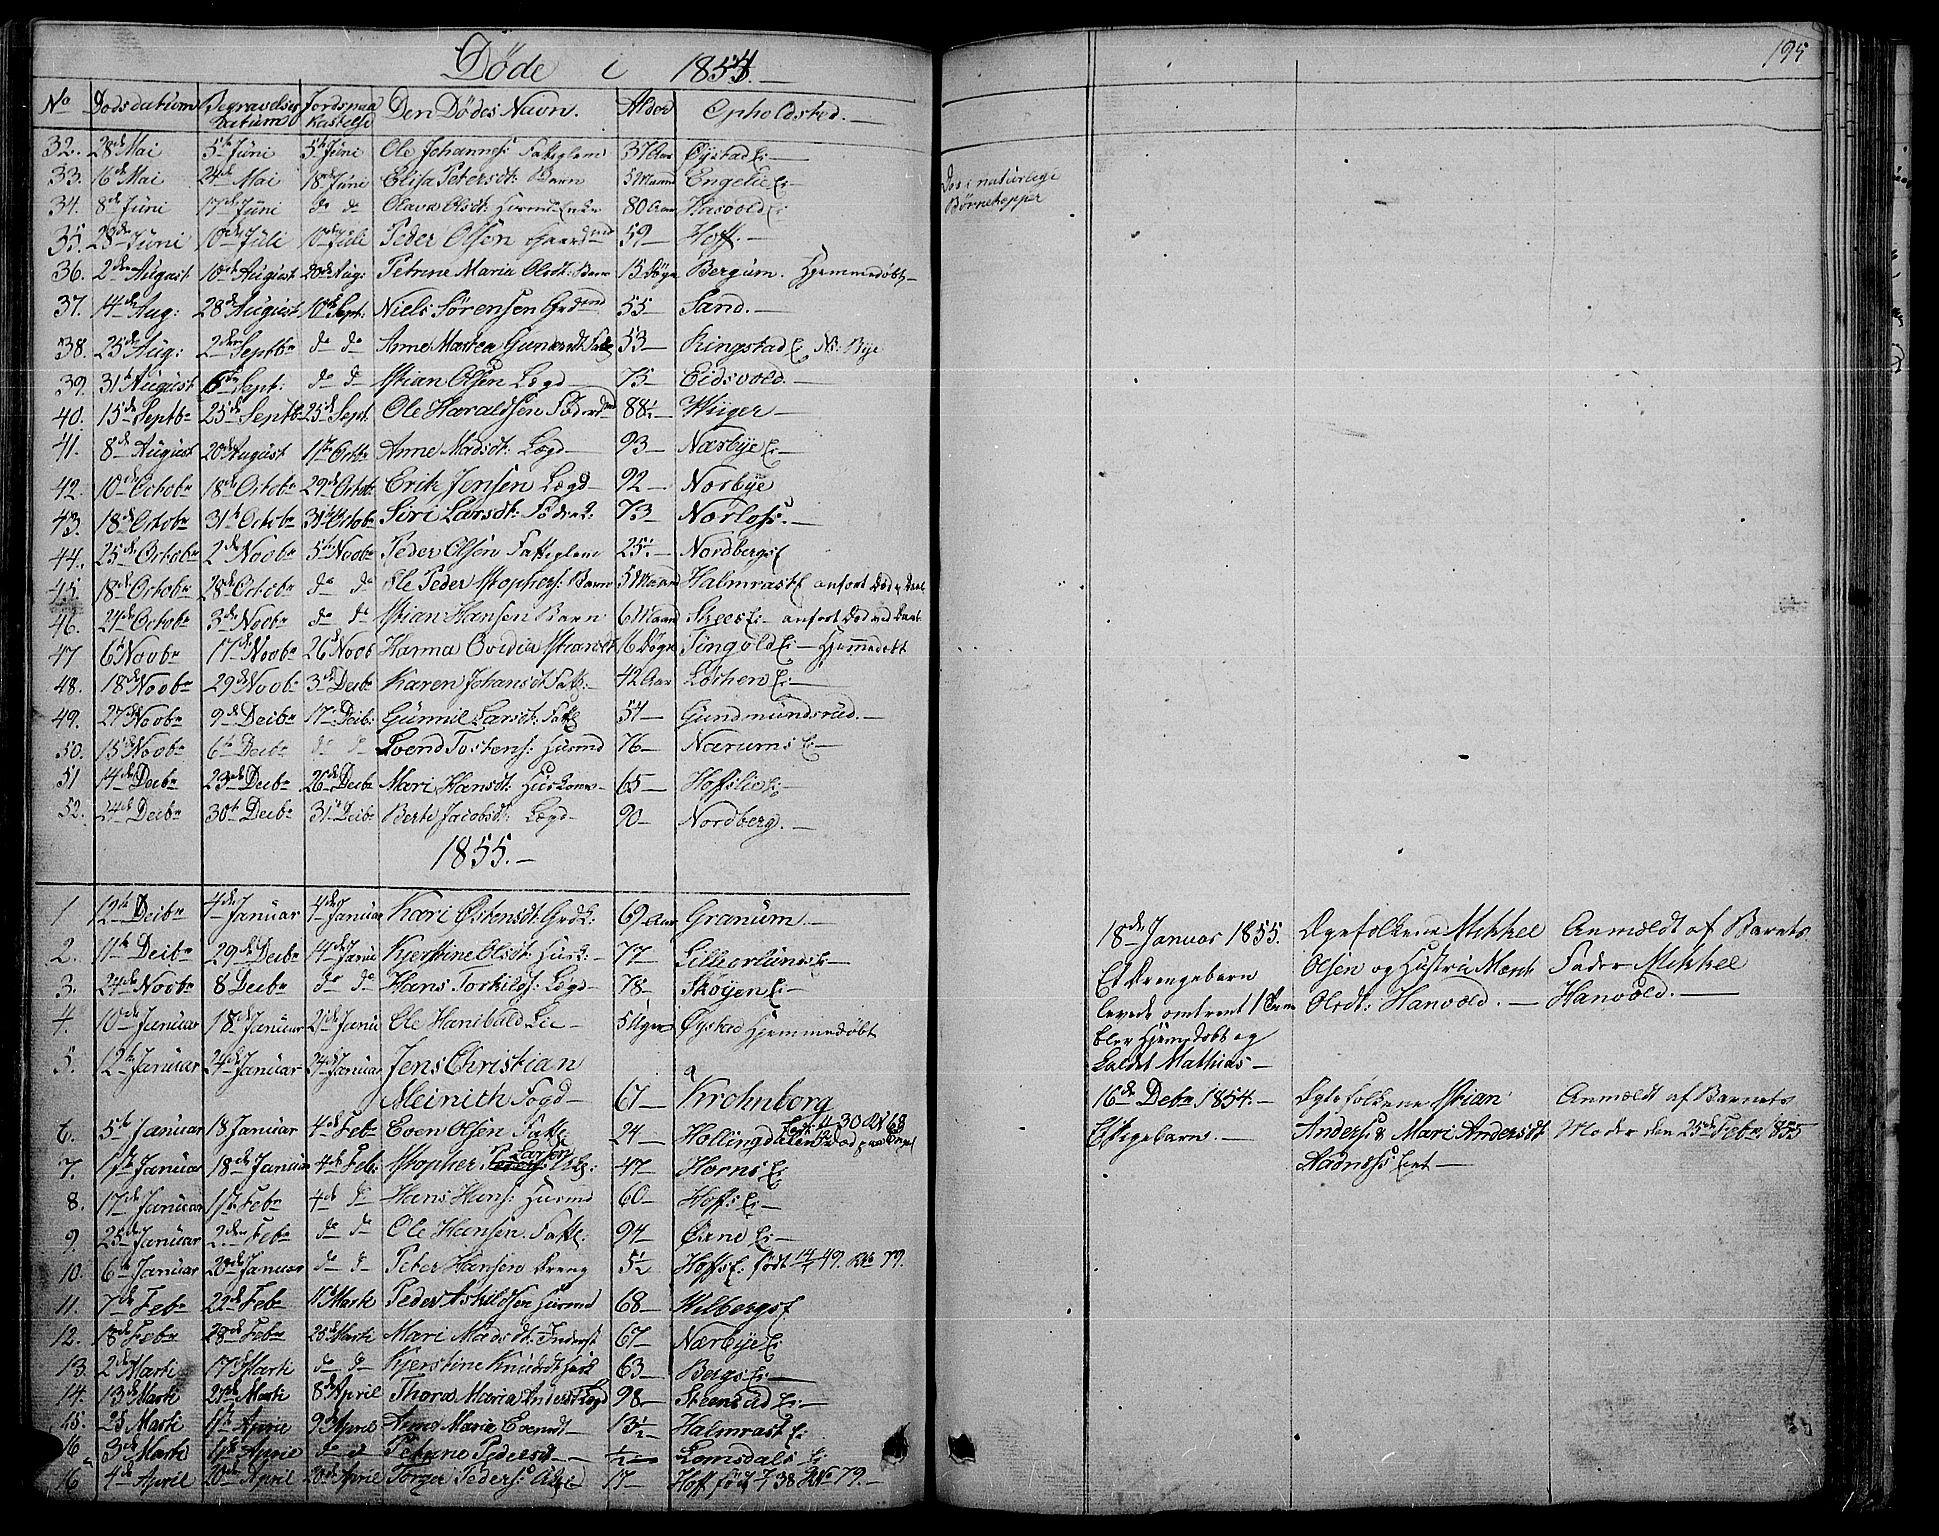 SAH, Søndre Land prestekontor, L/L0001: Klokkerbok nr. 1, 1849-1883, s. 195